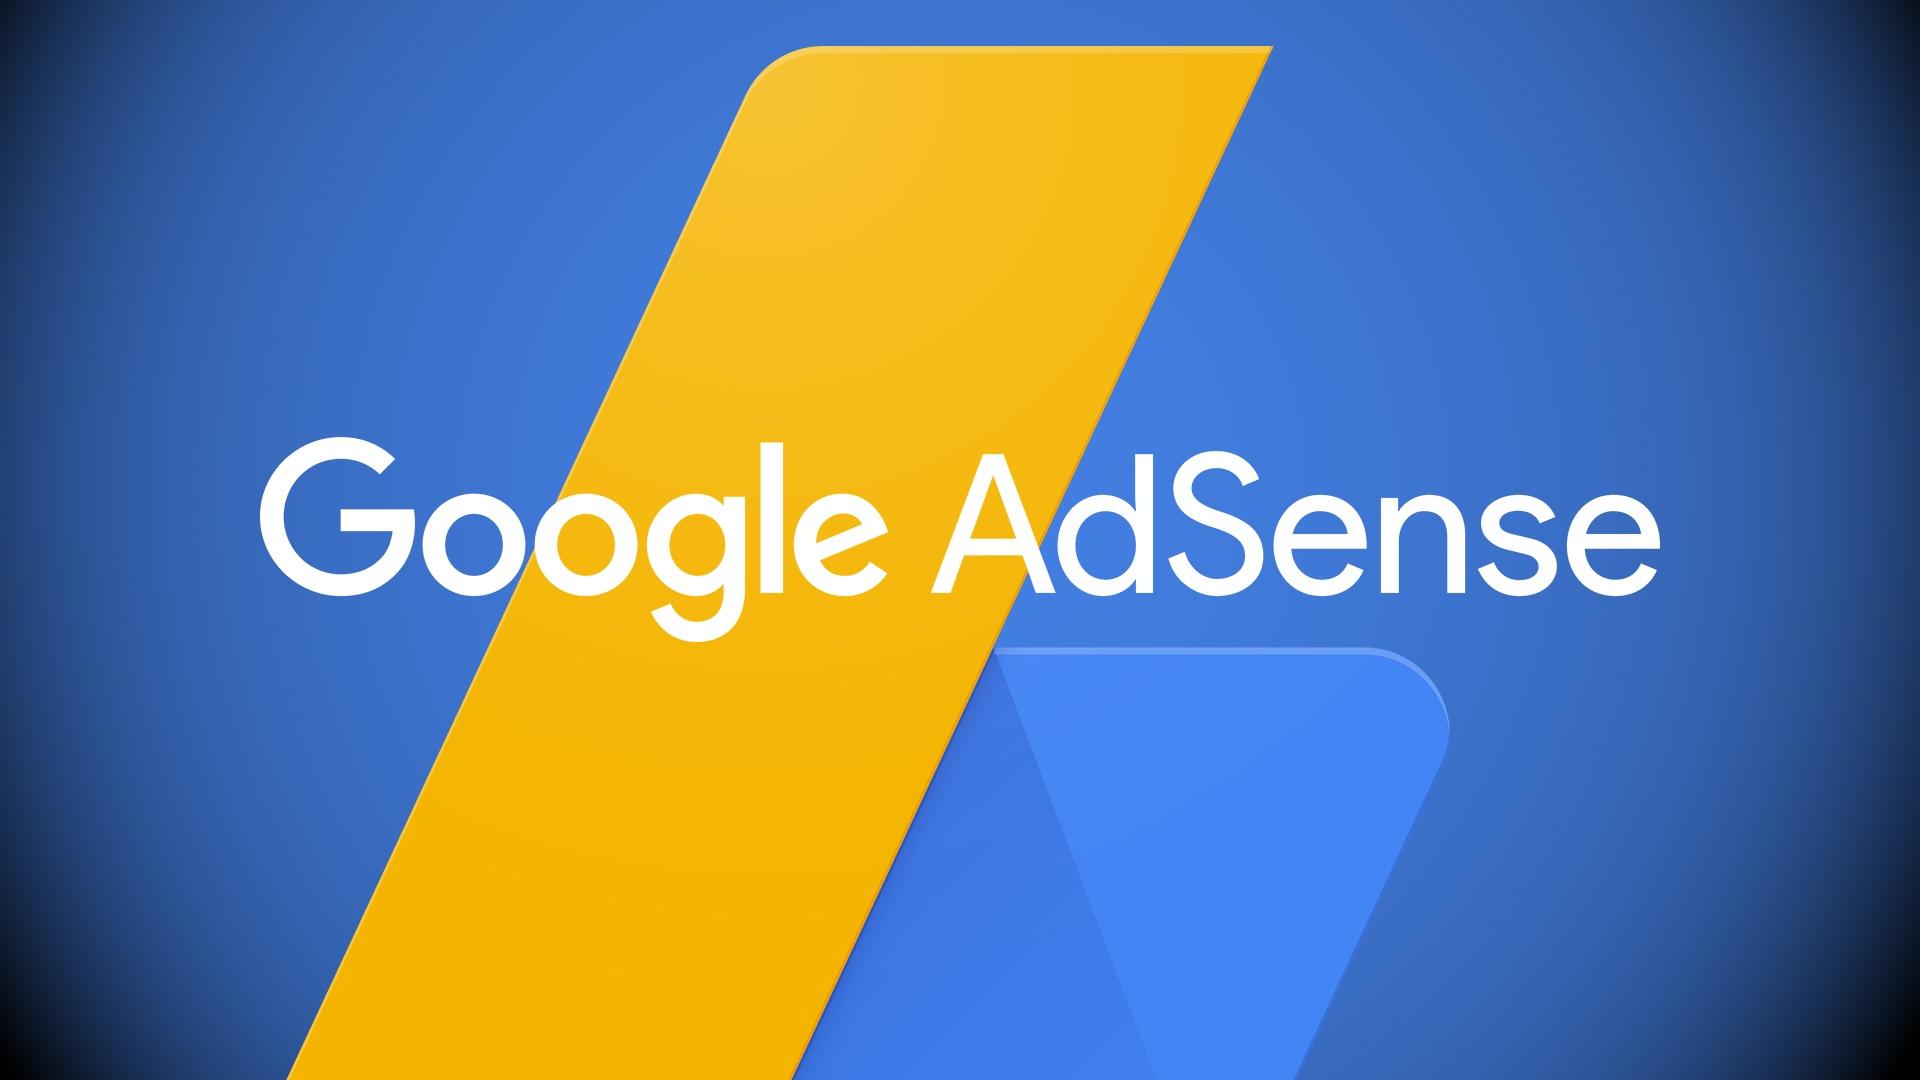 Google Adsense New Wallpaper